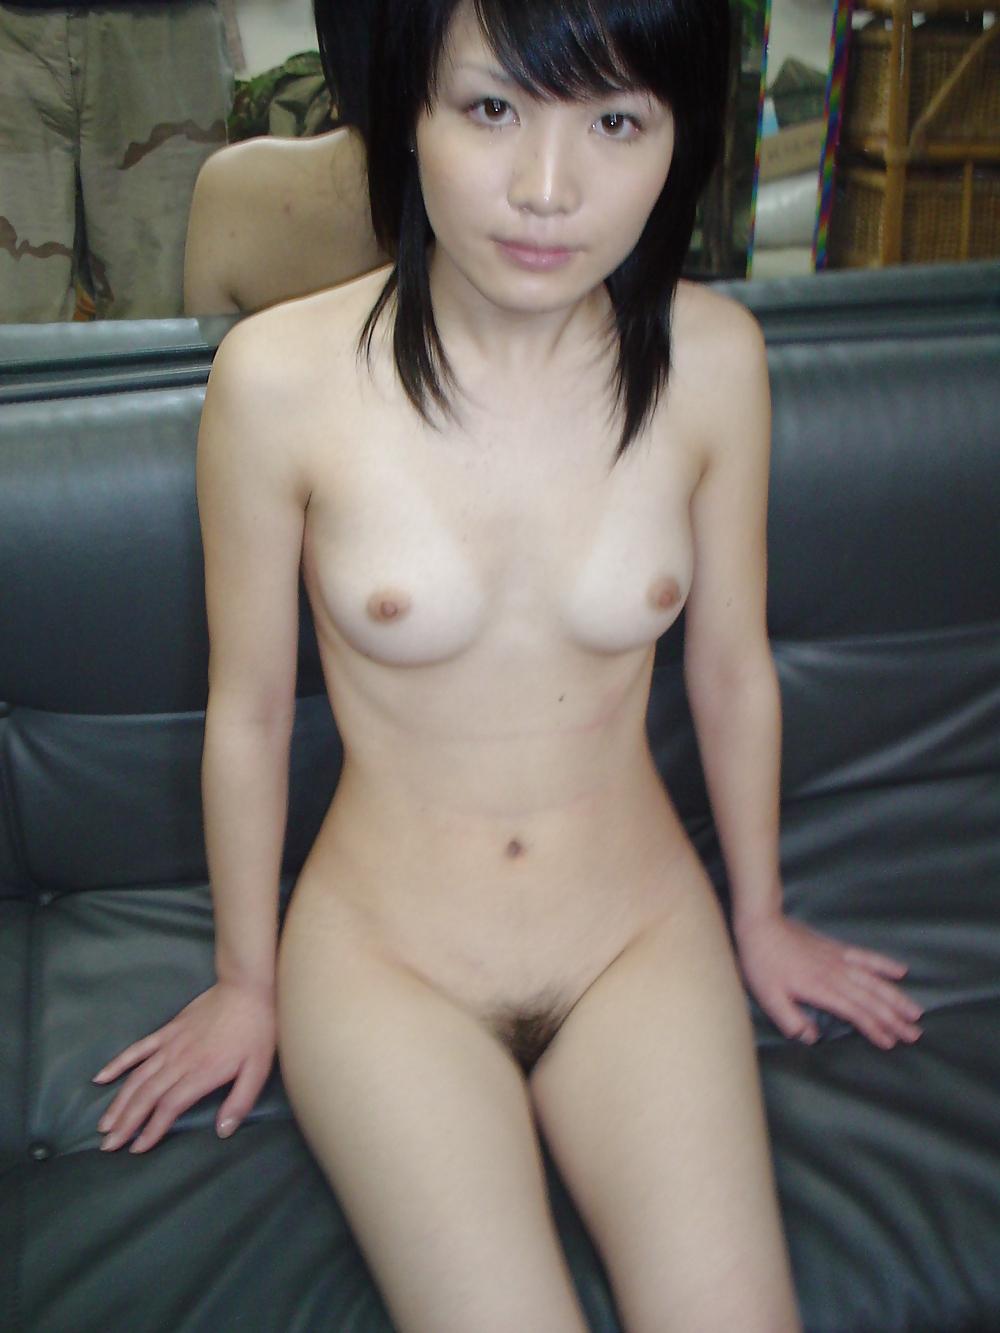 Girl chinese girl leaked nude